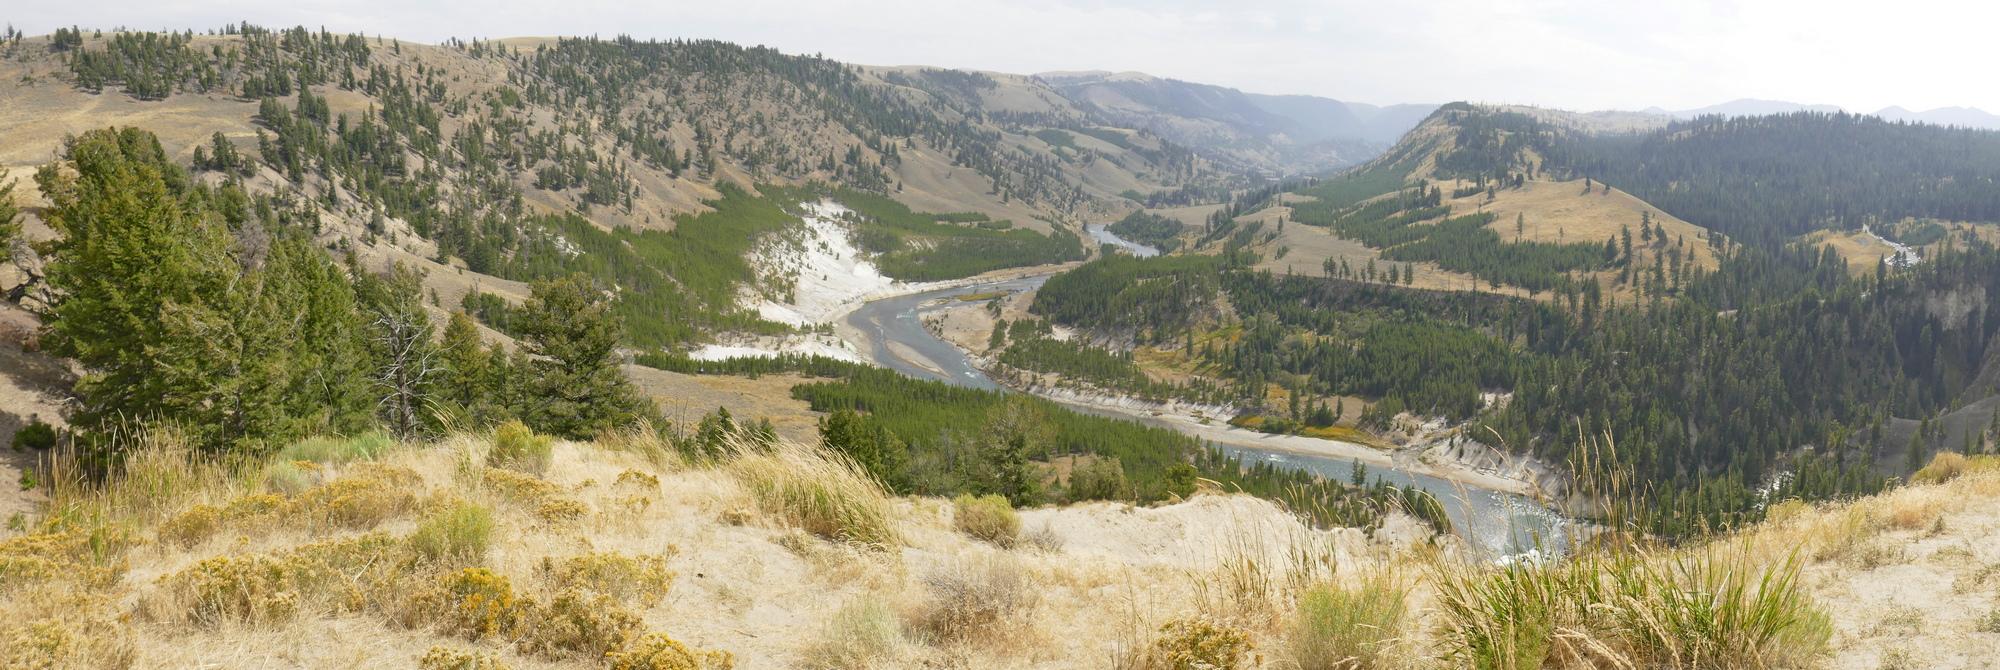 Riv Yellowstone basse et calcaire